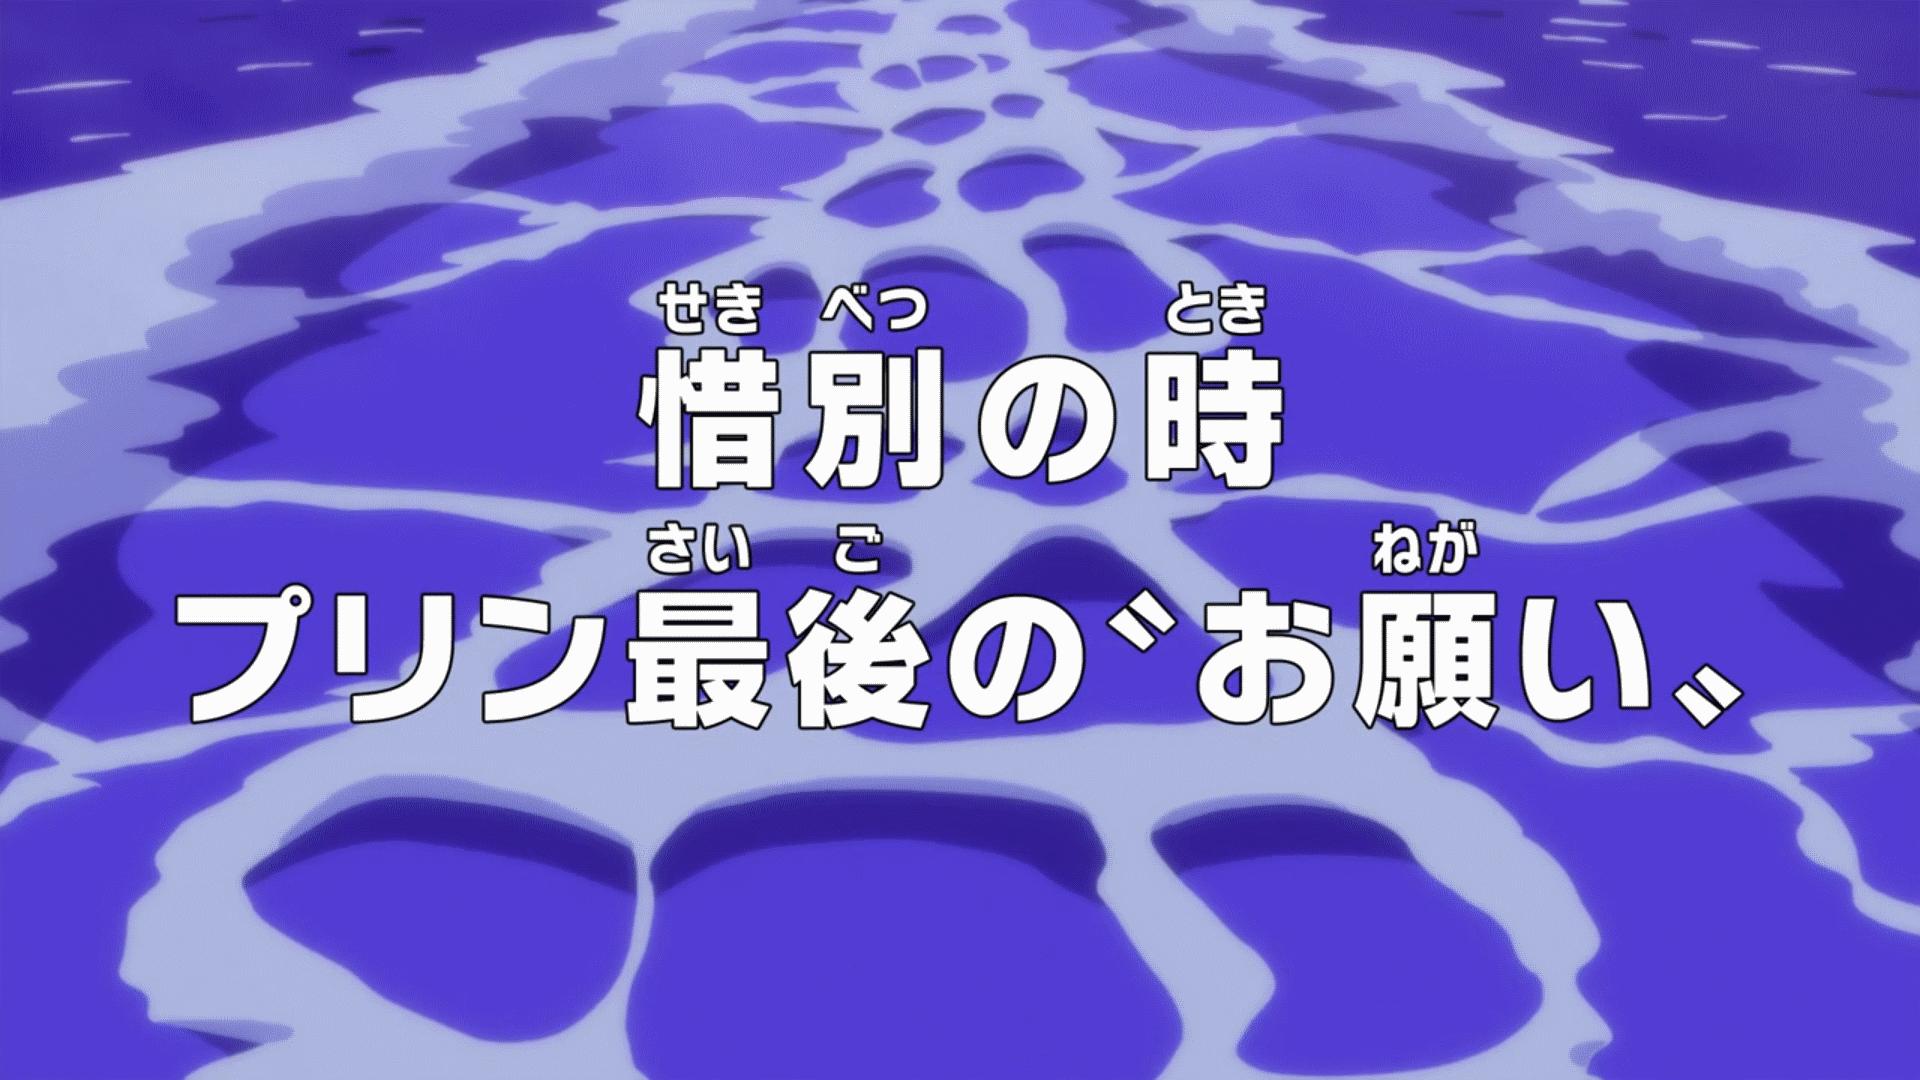 Episode 877